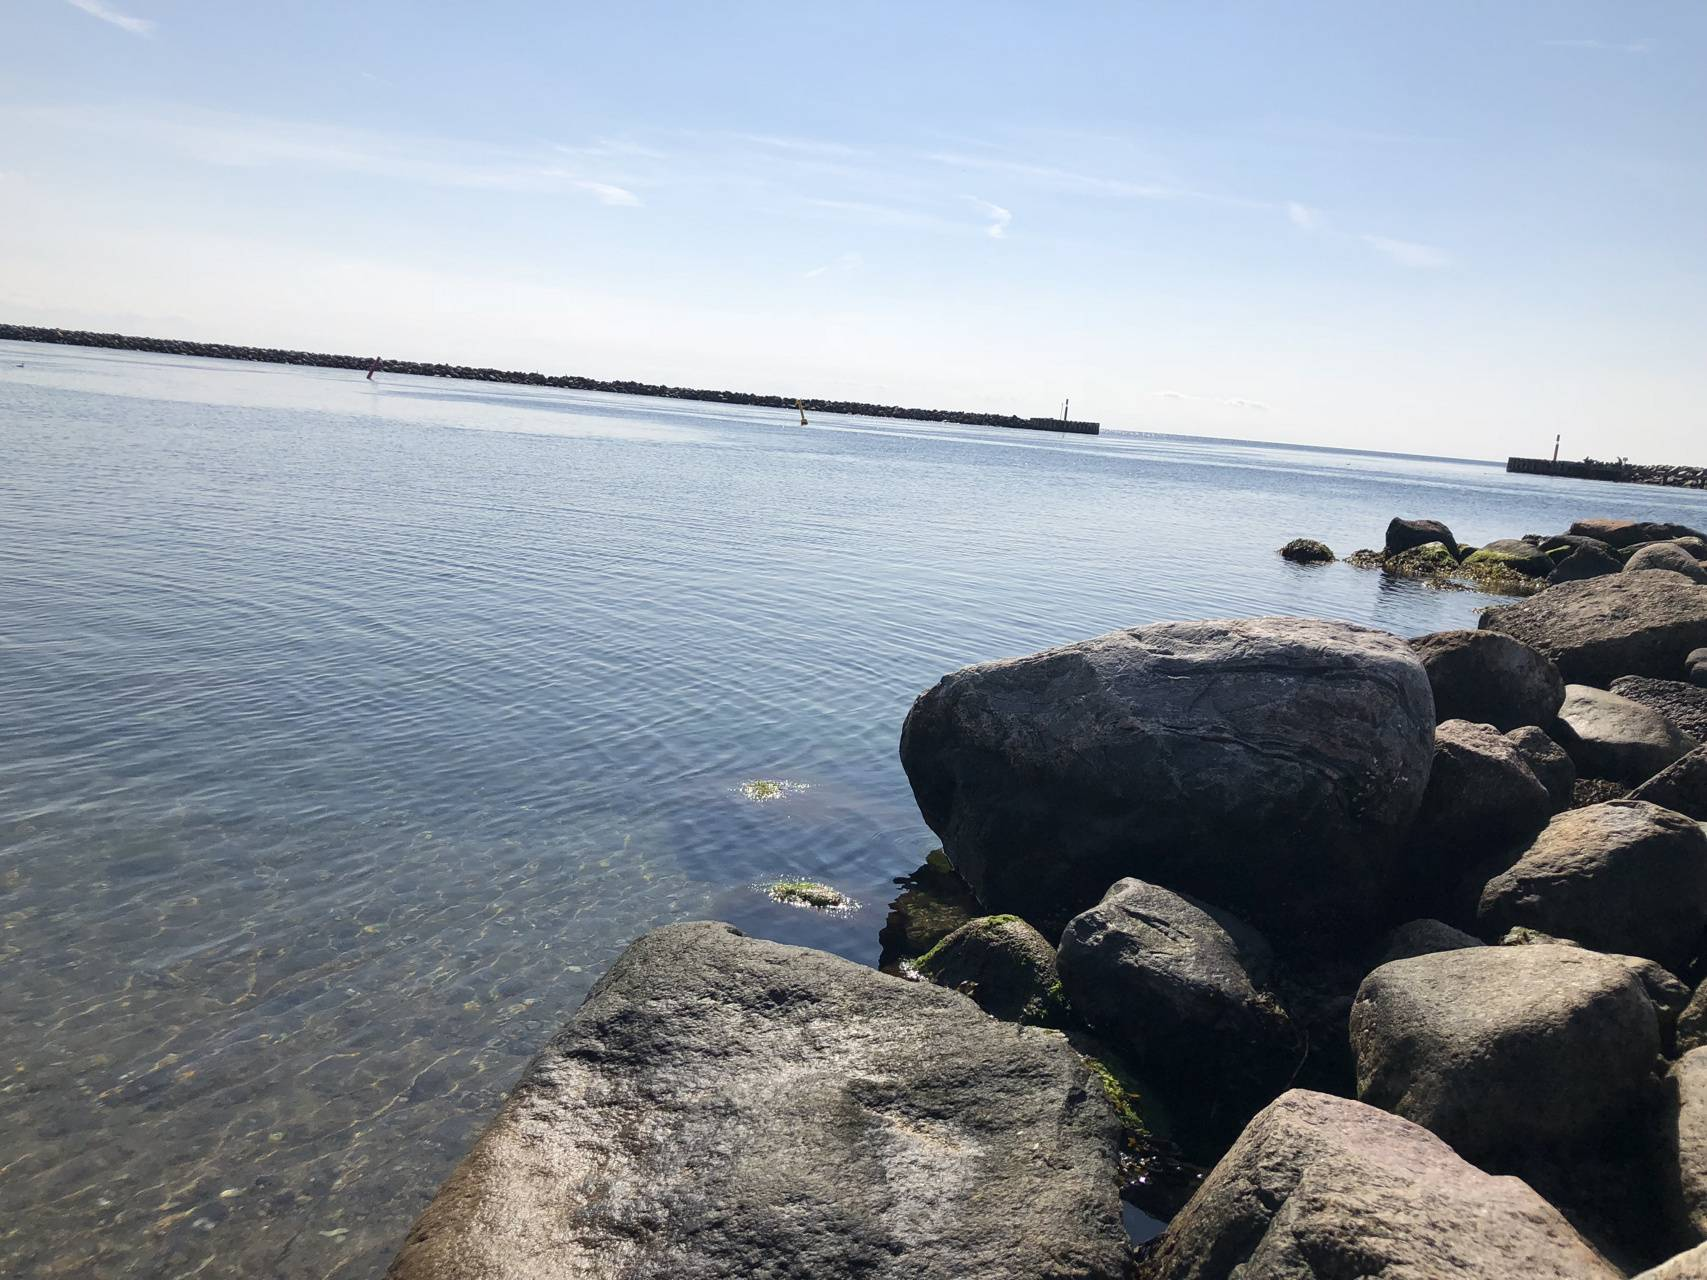 Harbor Karrebaek